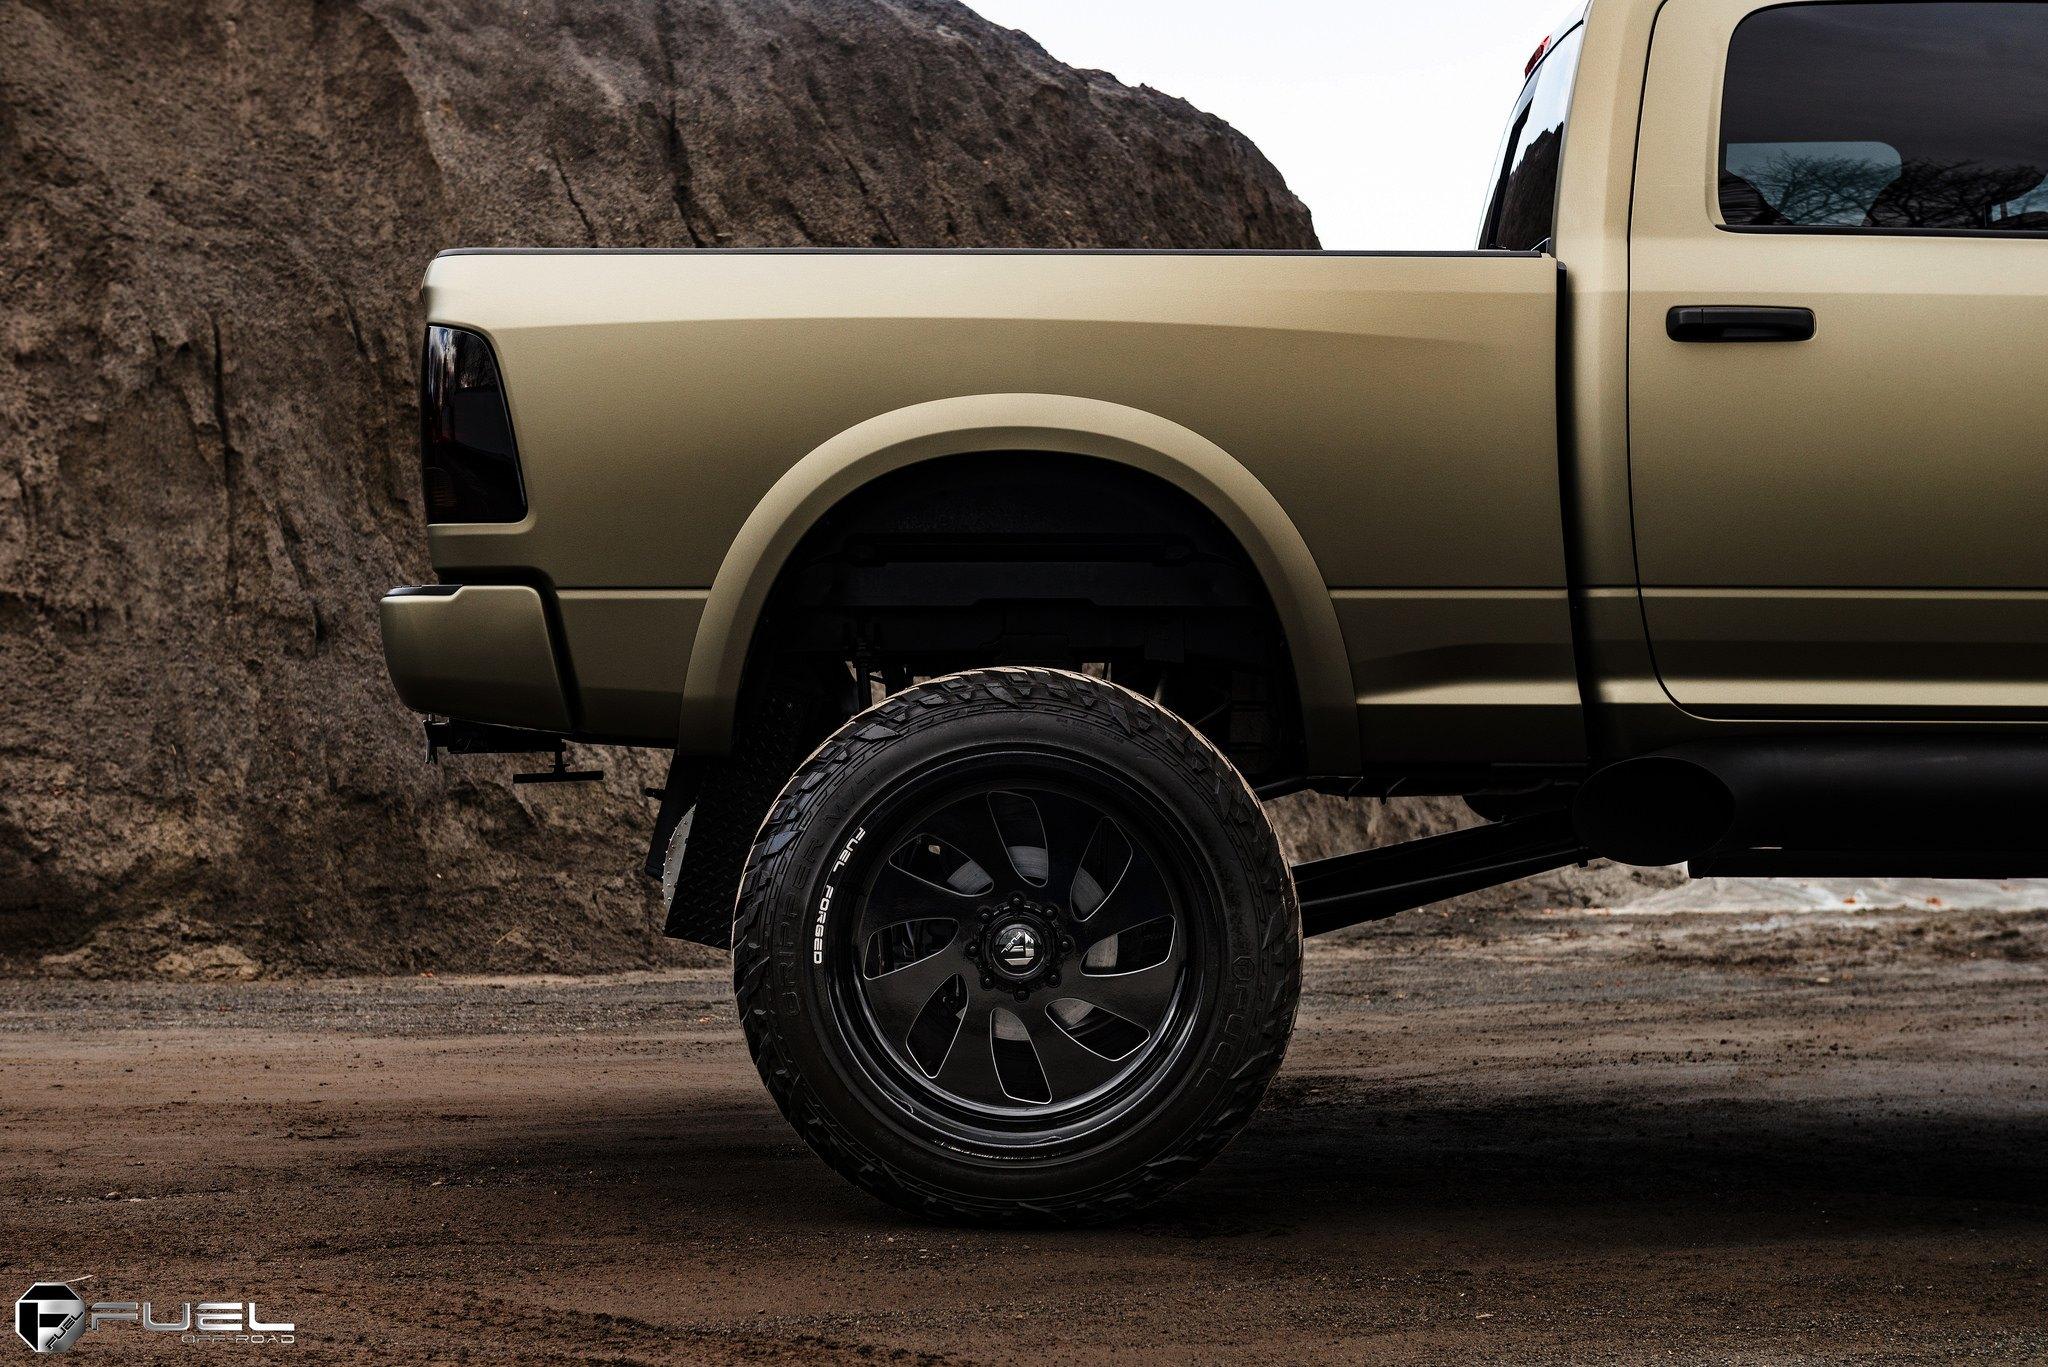 custom lifted dodge ram on black forged custom wheels by fuel gallery. Black Bedroom Furniture Sets. Home Design Ideas